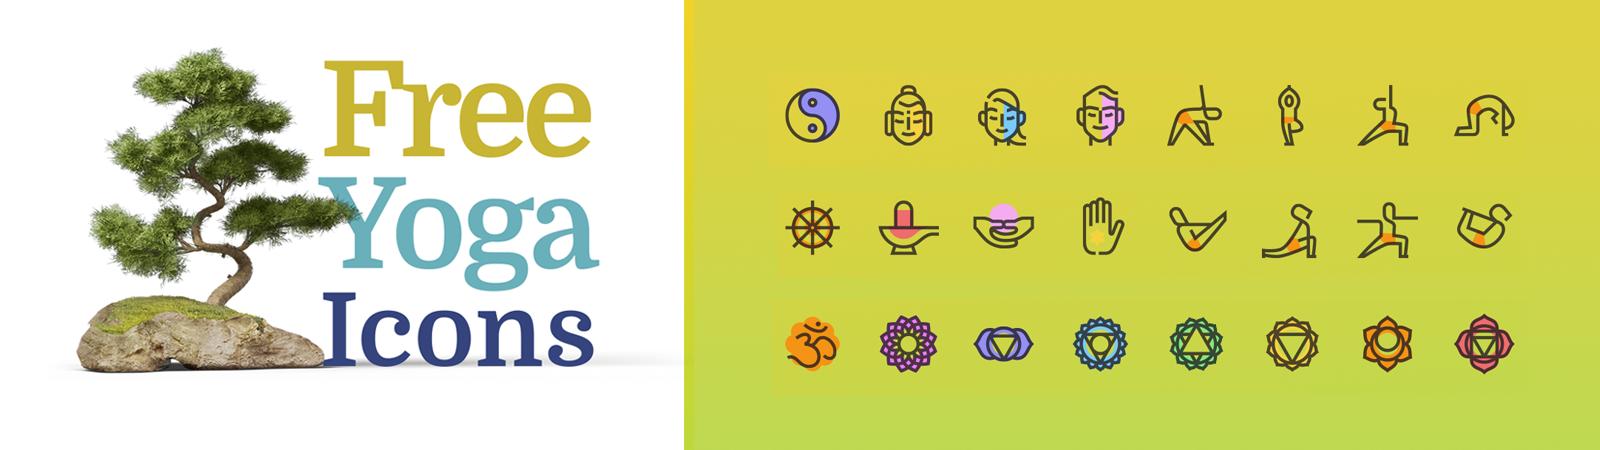 Free Icons - Iconshock